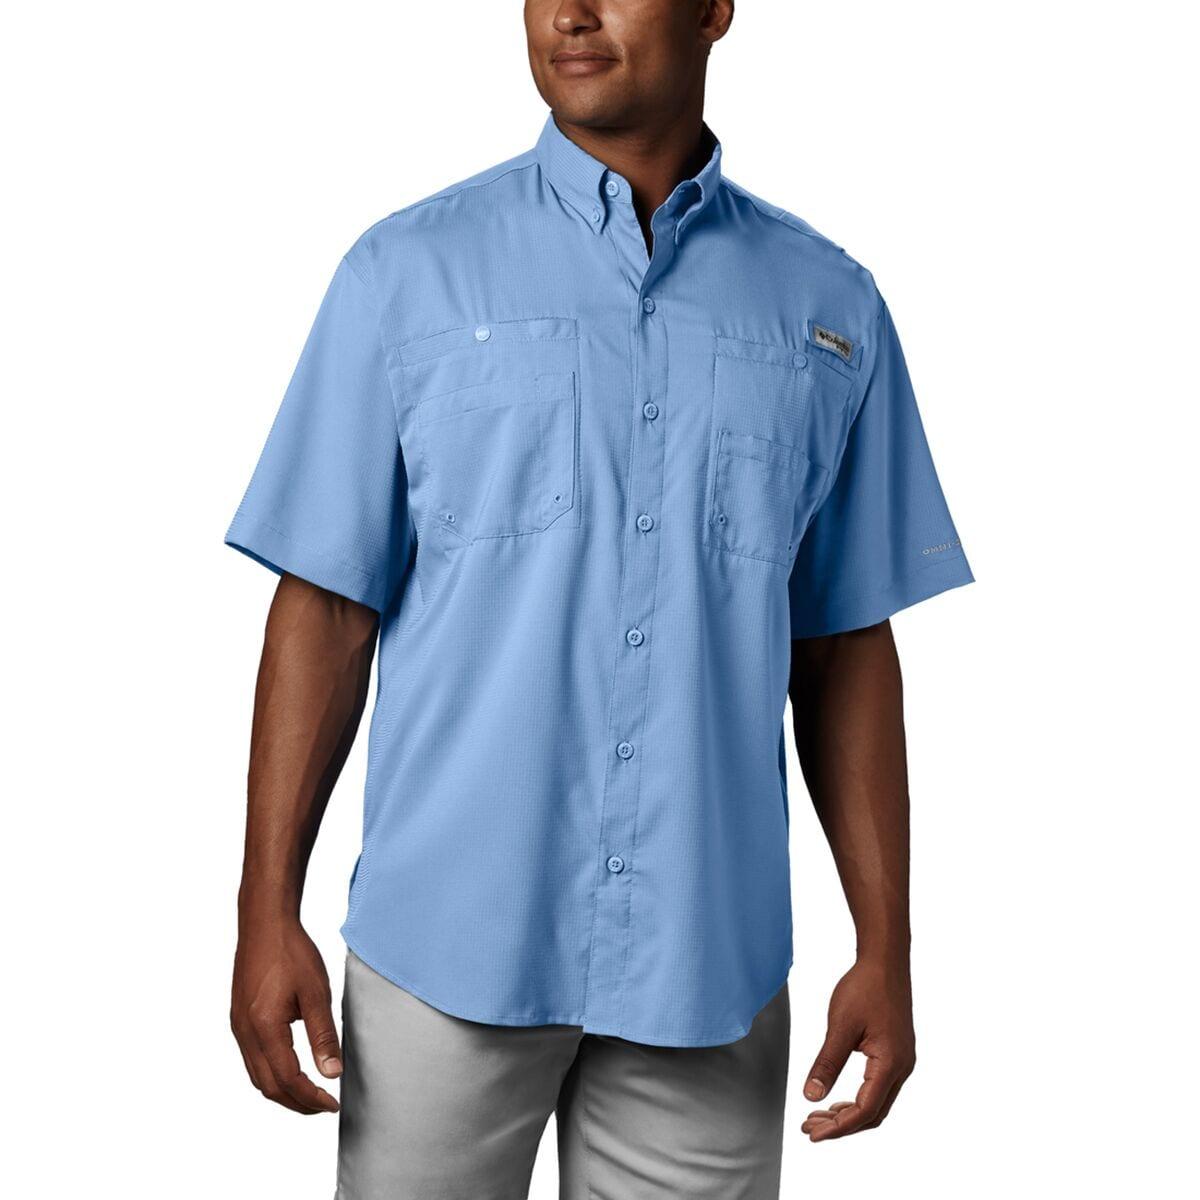 Columbia Tamiami II Shirt - Men